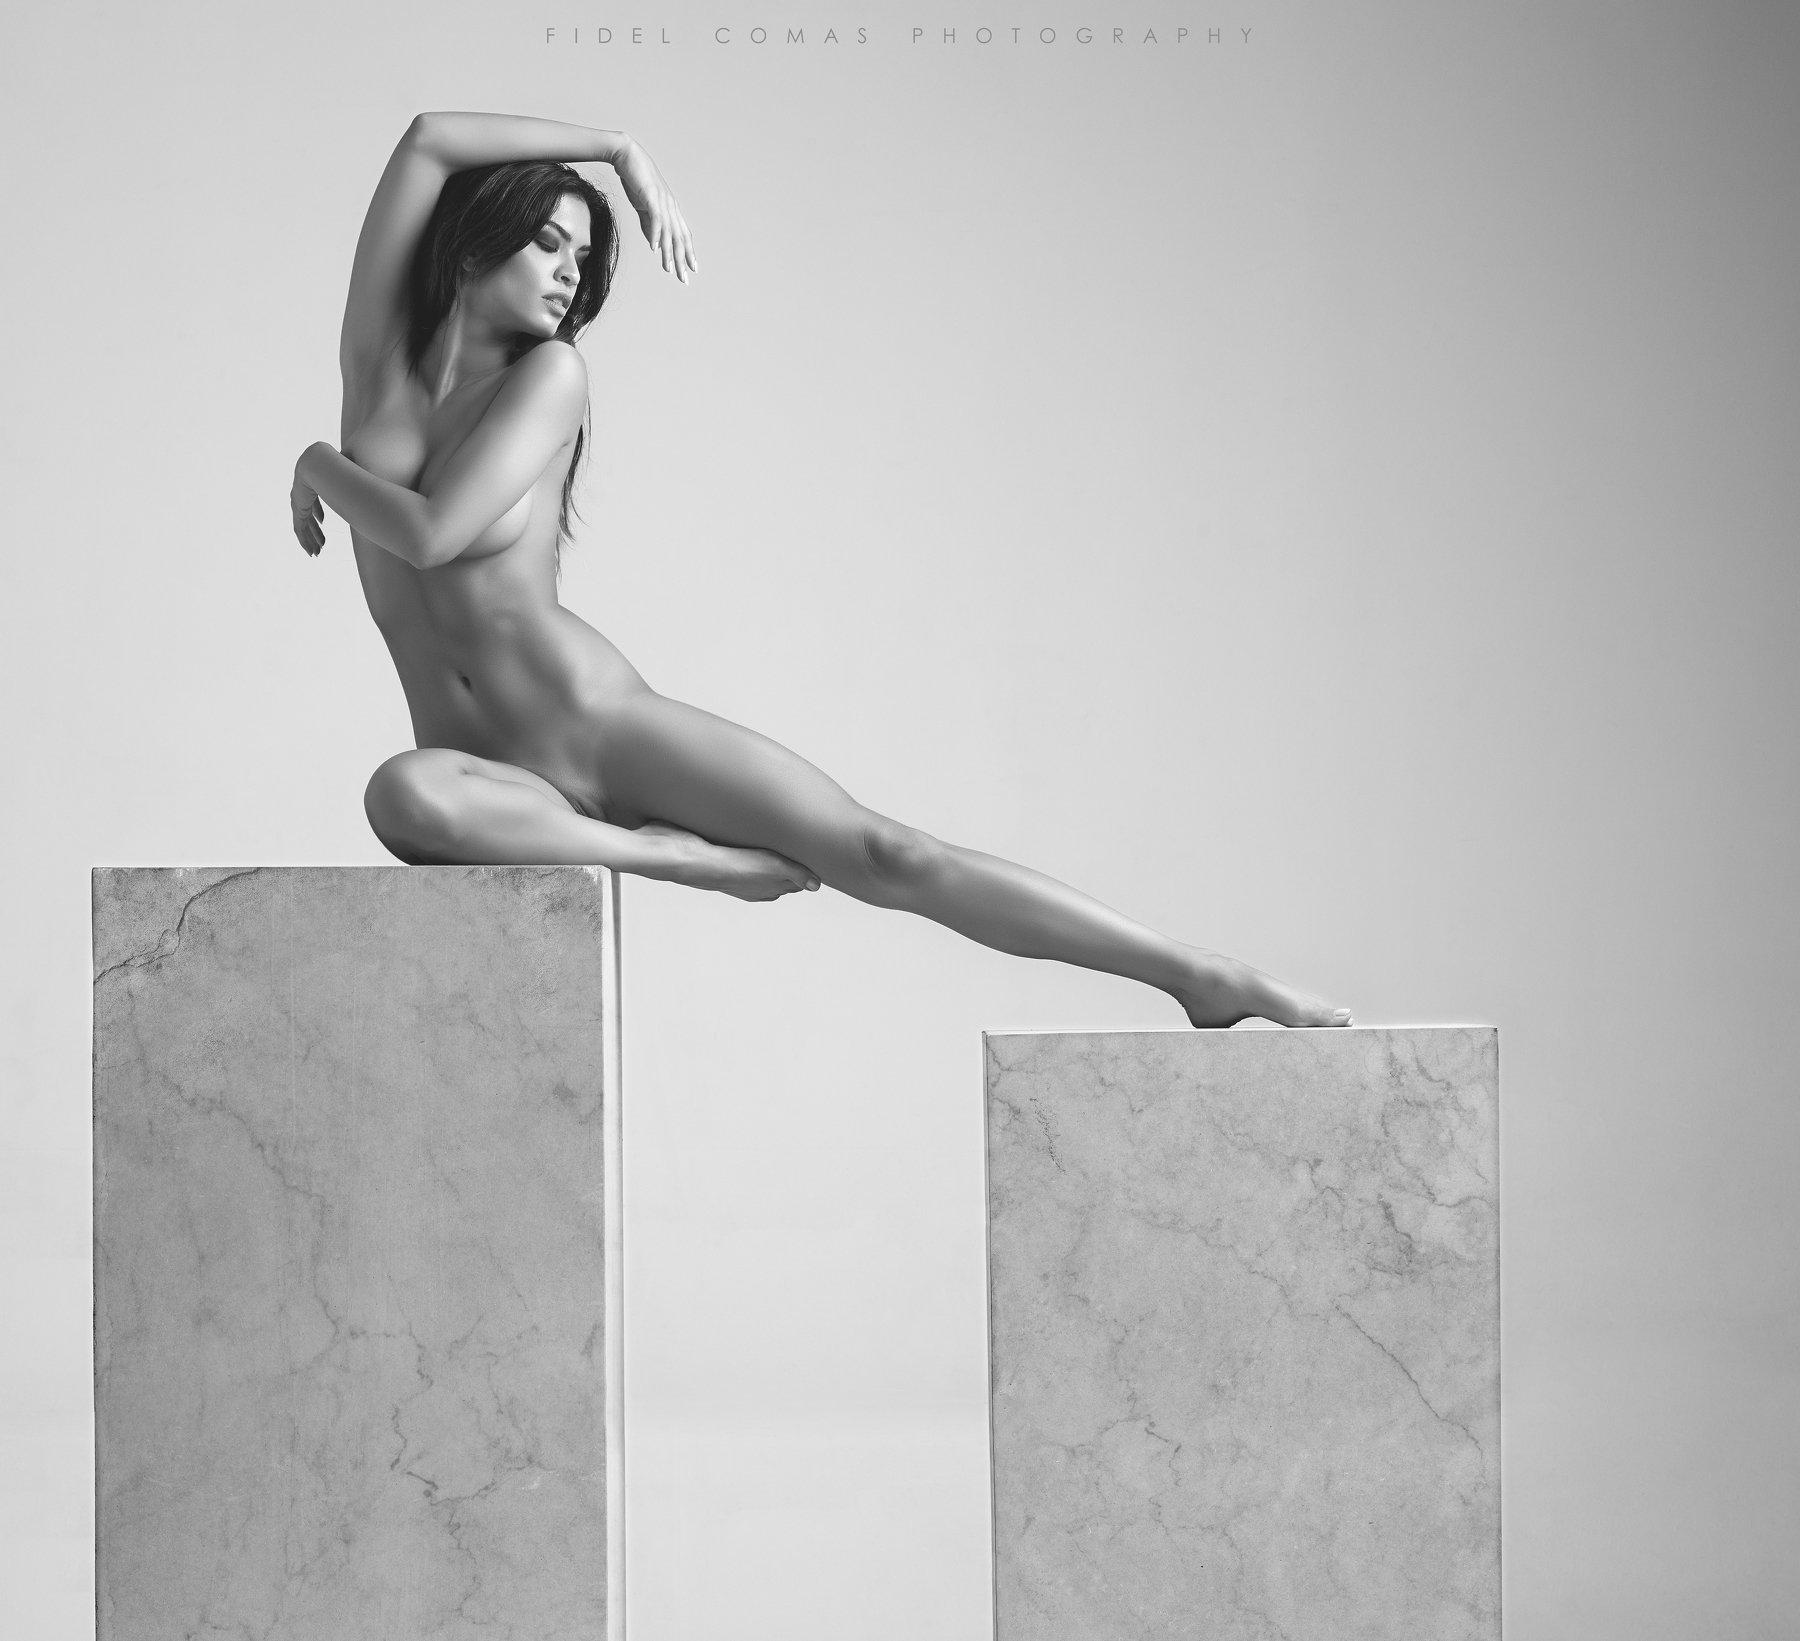 model, monochrome, art, studio, Fidel Comas